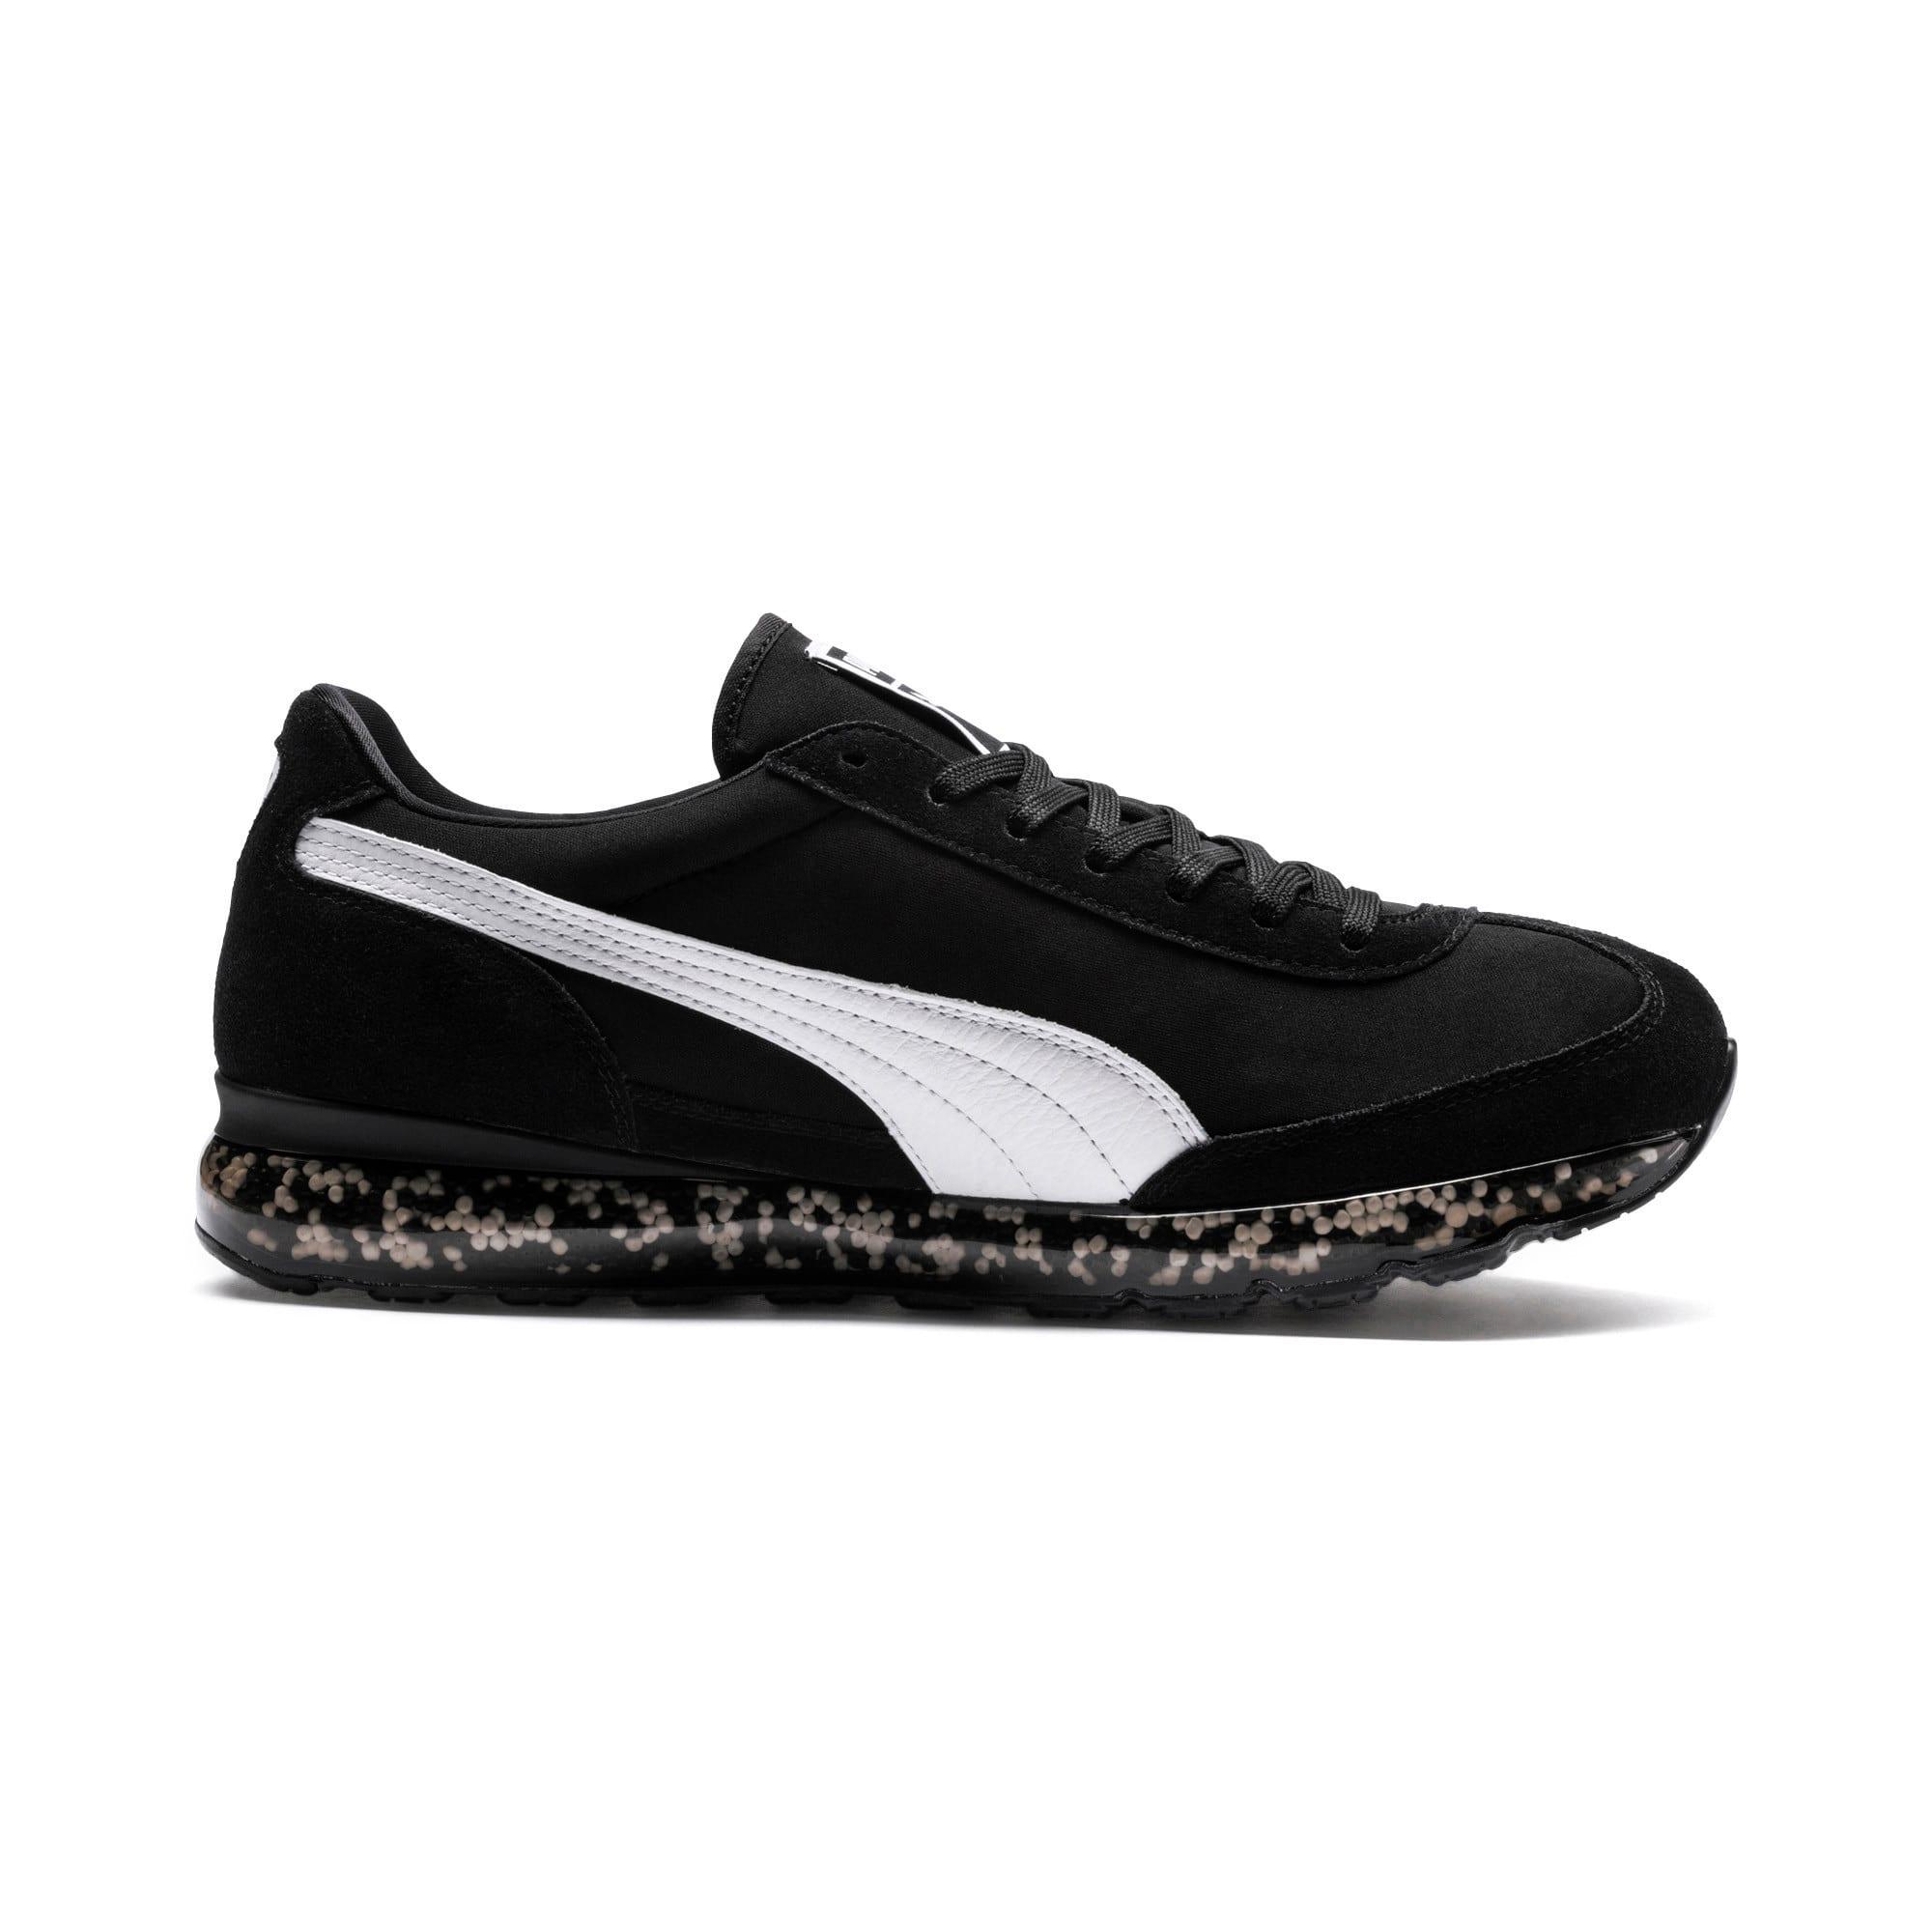 Thumbnail 5 of Jamming Easy Rider Running Shoes, Puma Black-Puma White, medium